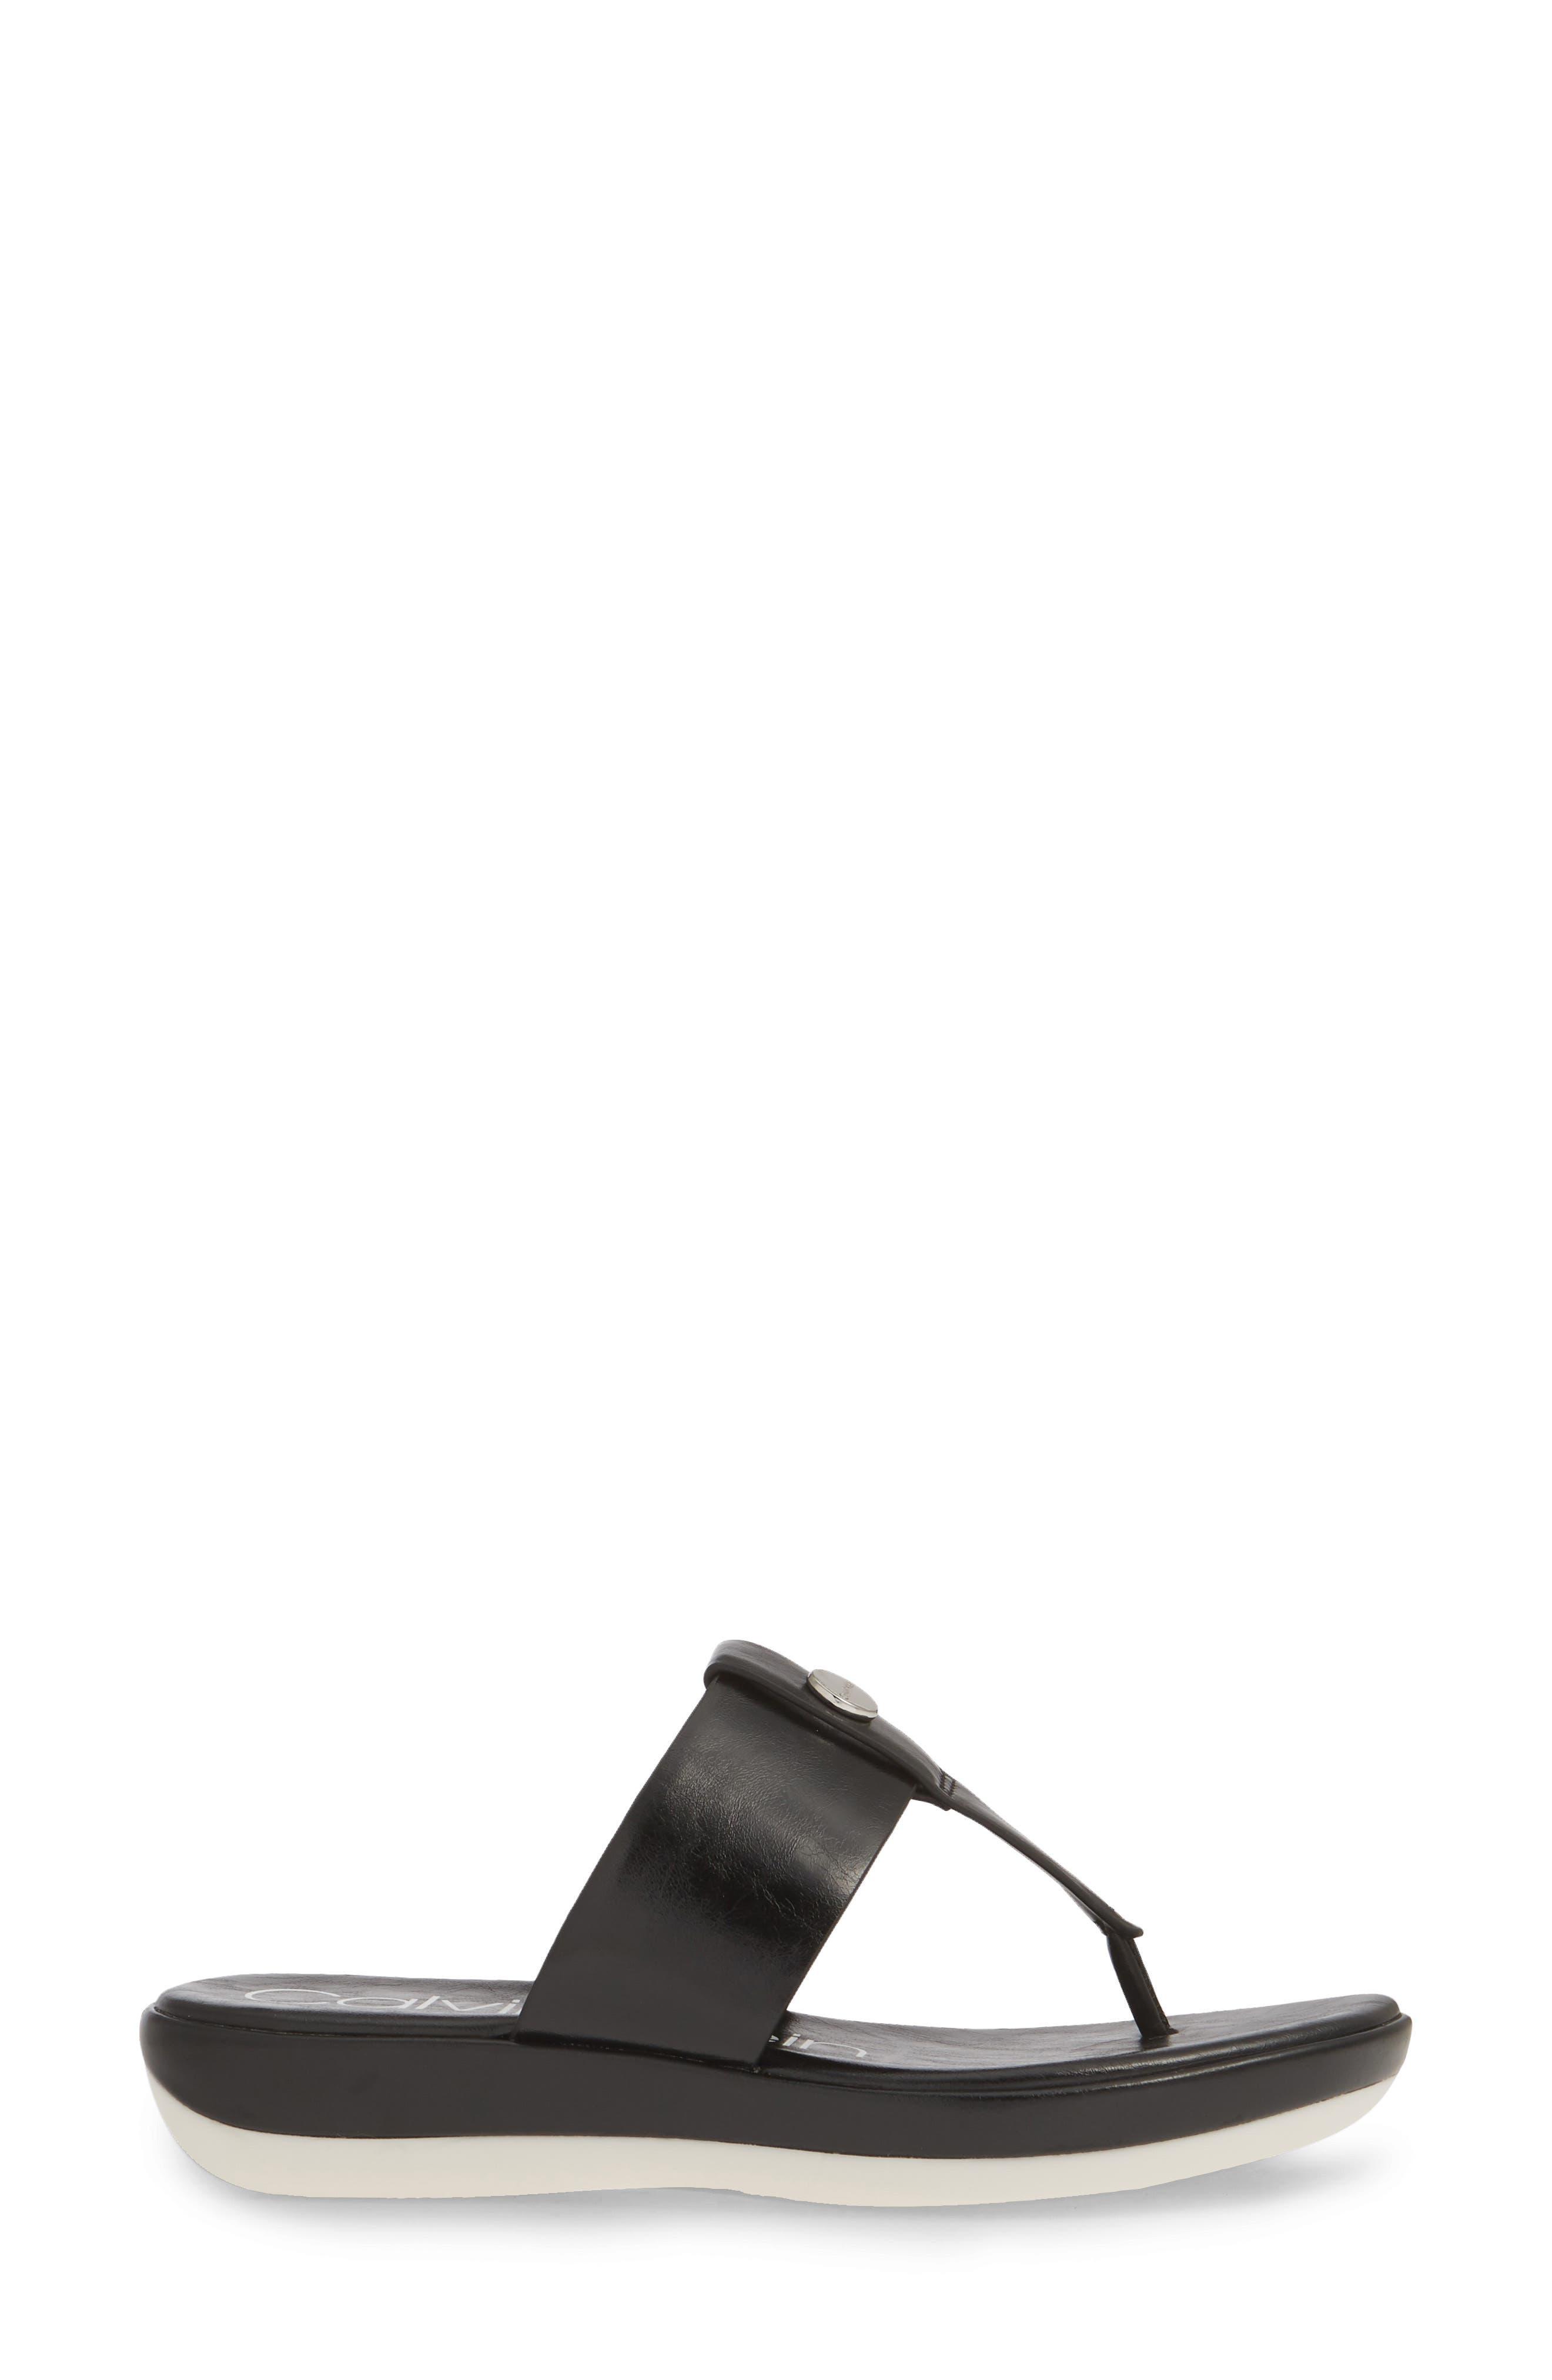 CALVIN KLEIN, Kimmy Platform Flip Flop, Alternate thumbnail 3, color, BLACK LEATHER